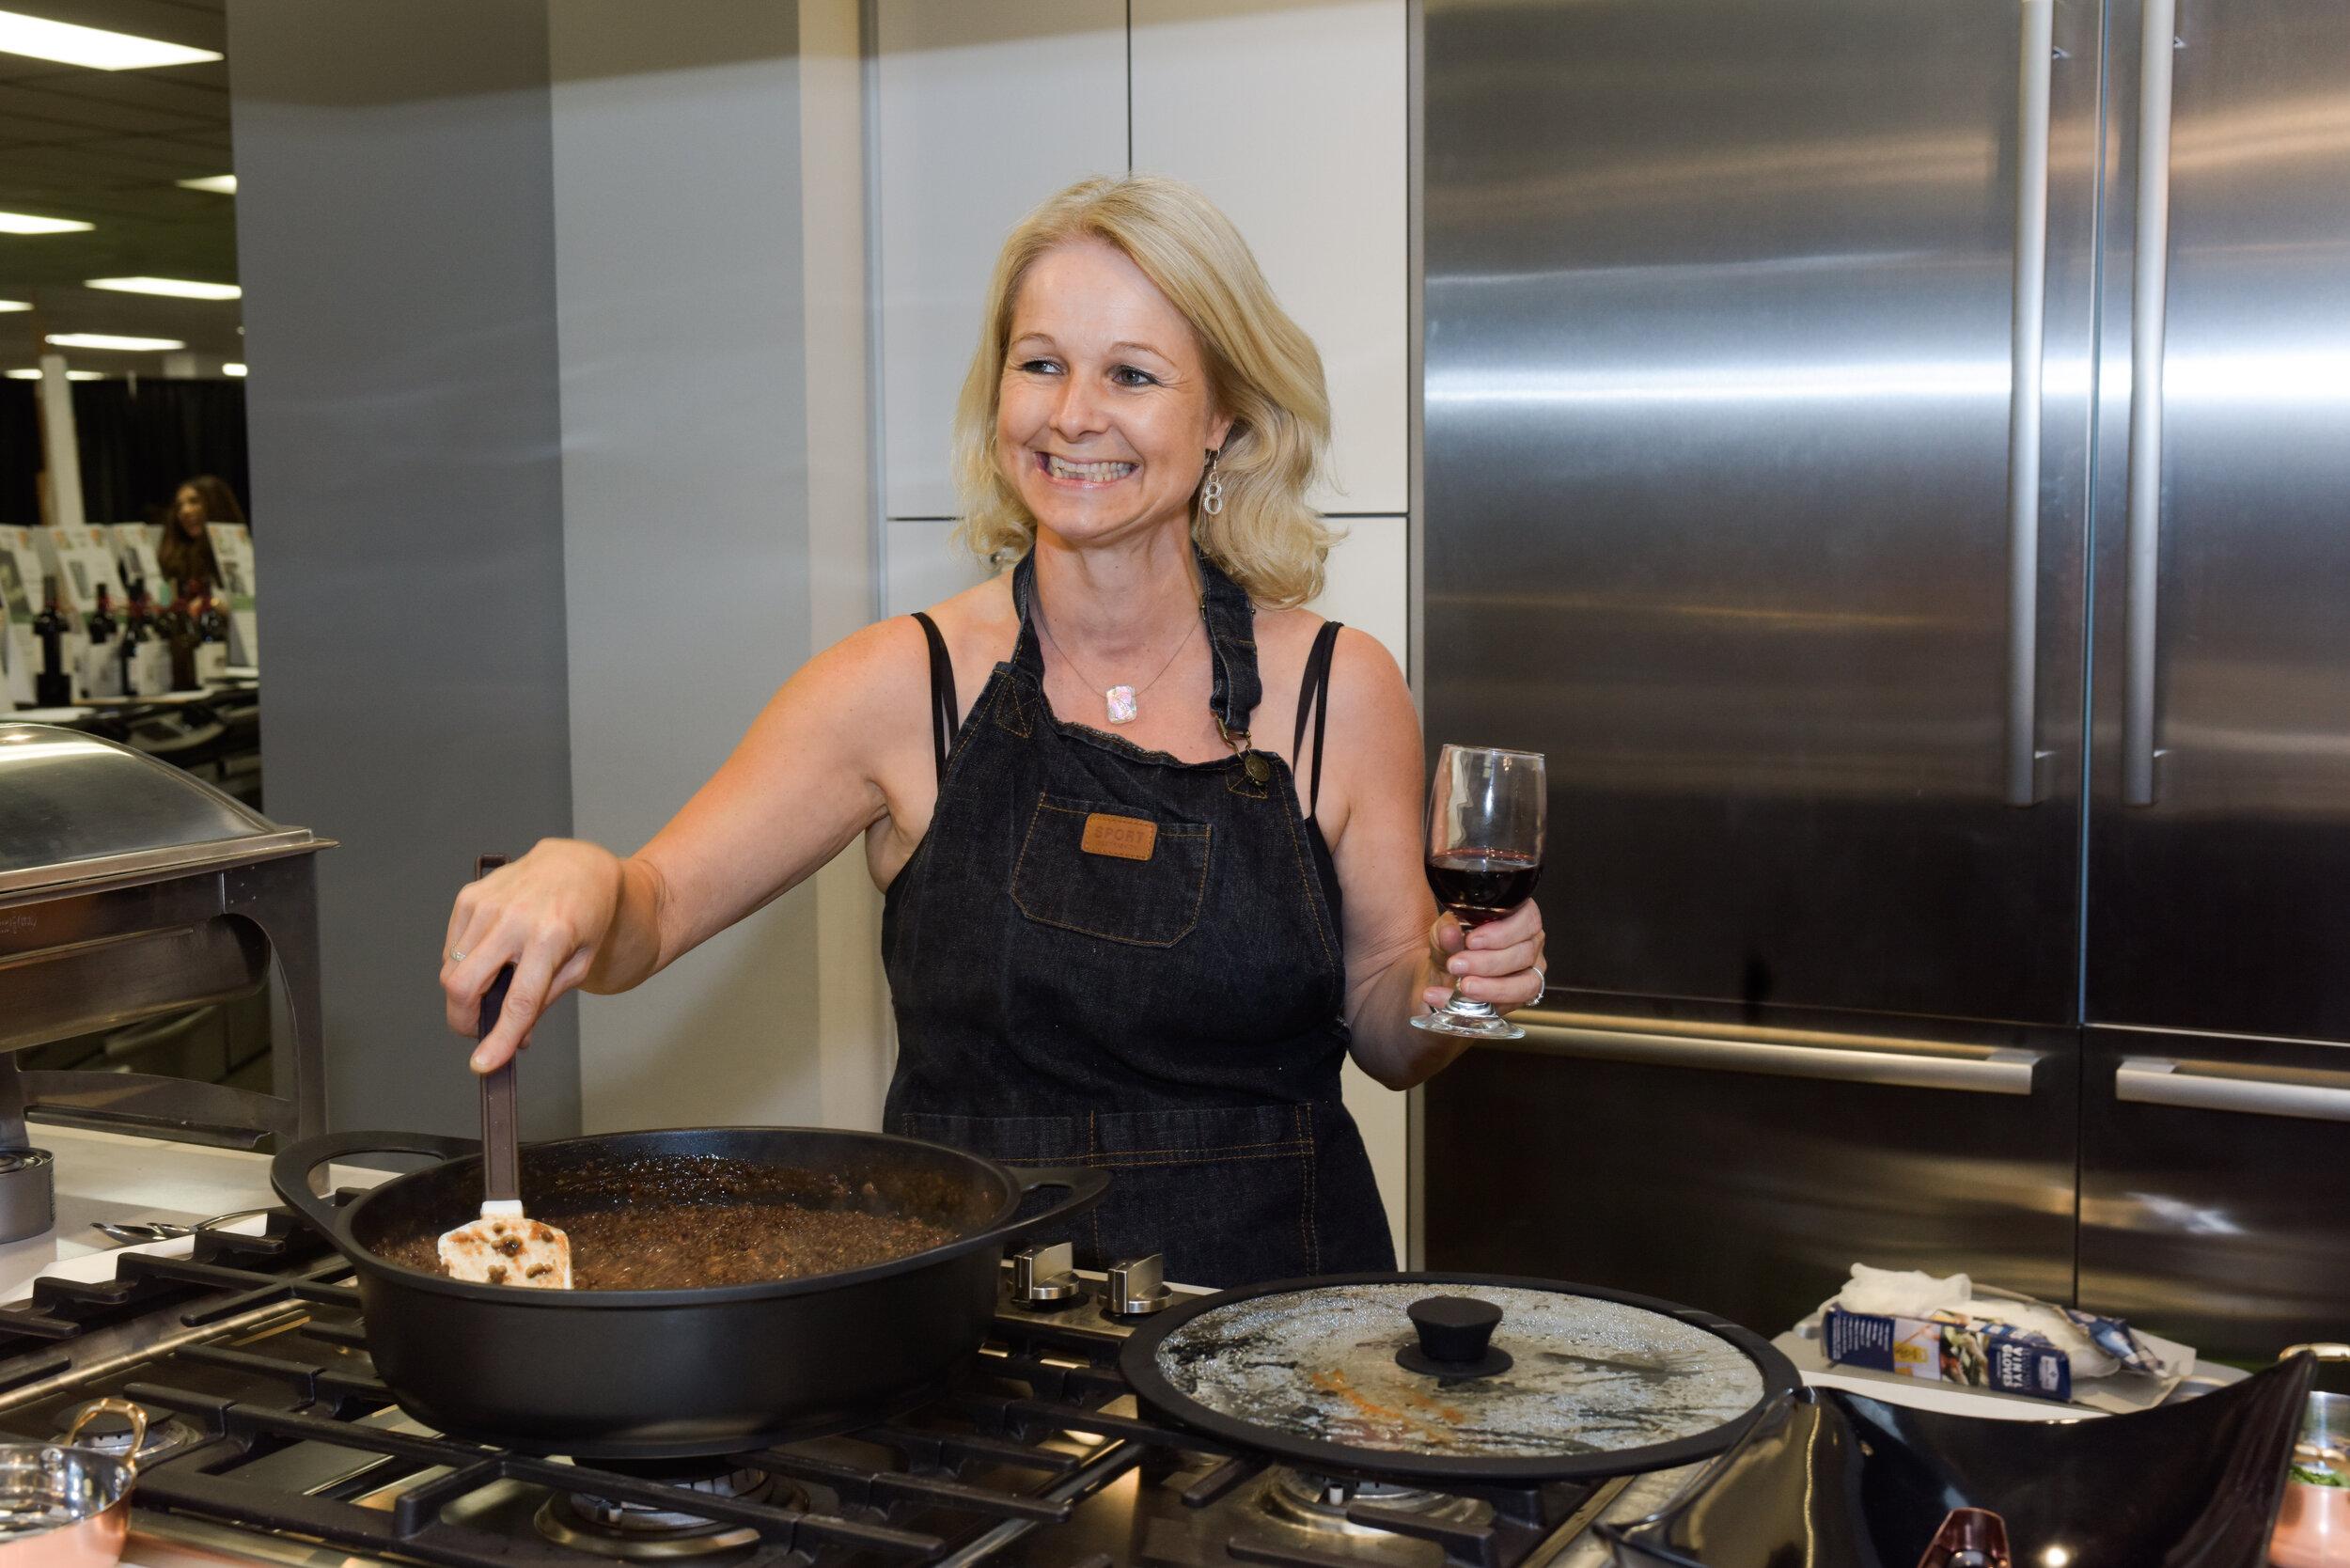 Chef Miranda Kaiser - Owner and Chef of Laffa Medi-Eastern Restaurant and Bar, Miranda